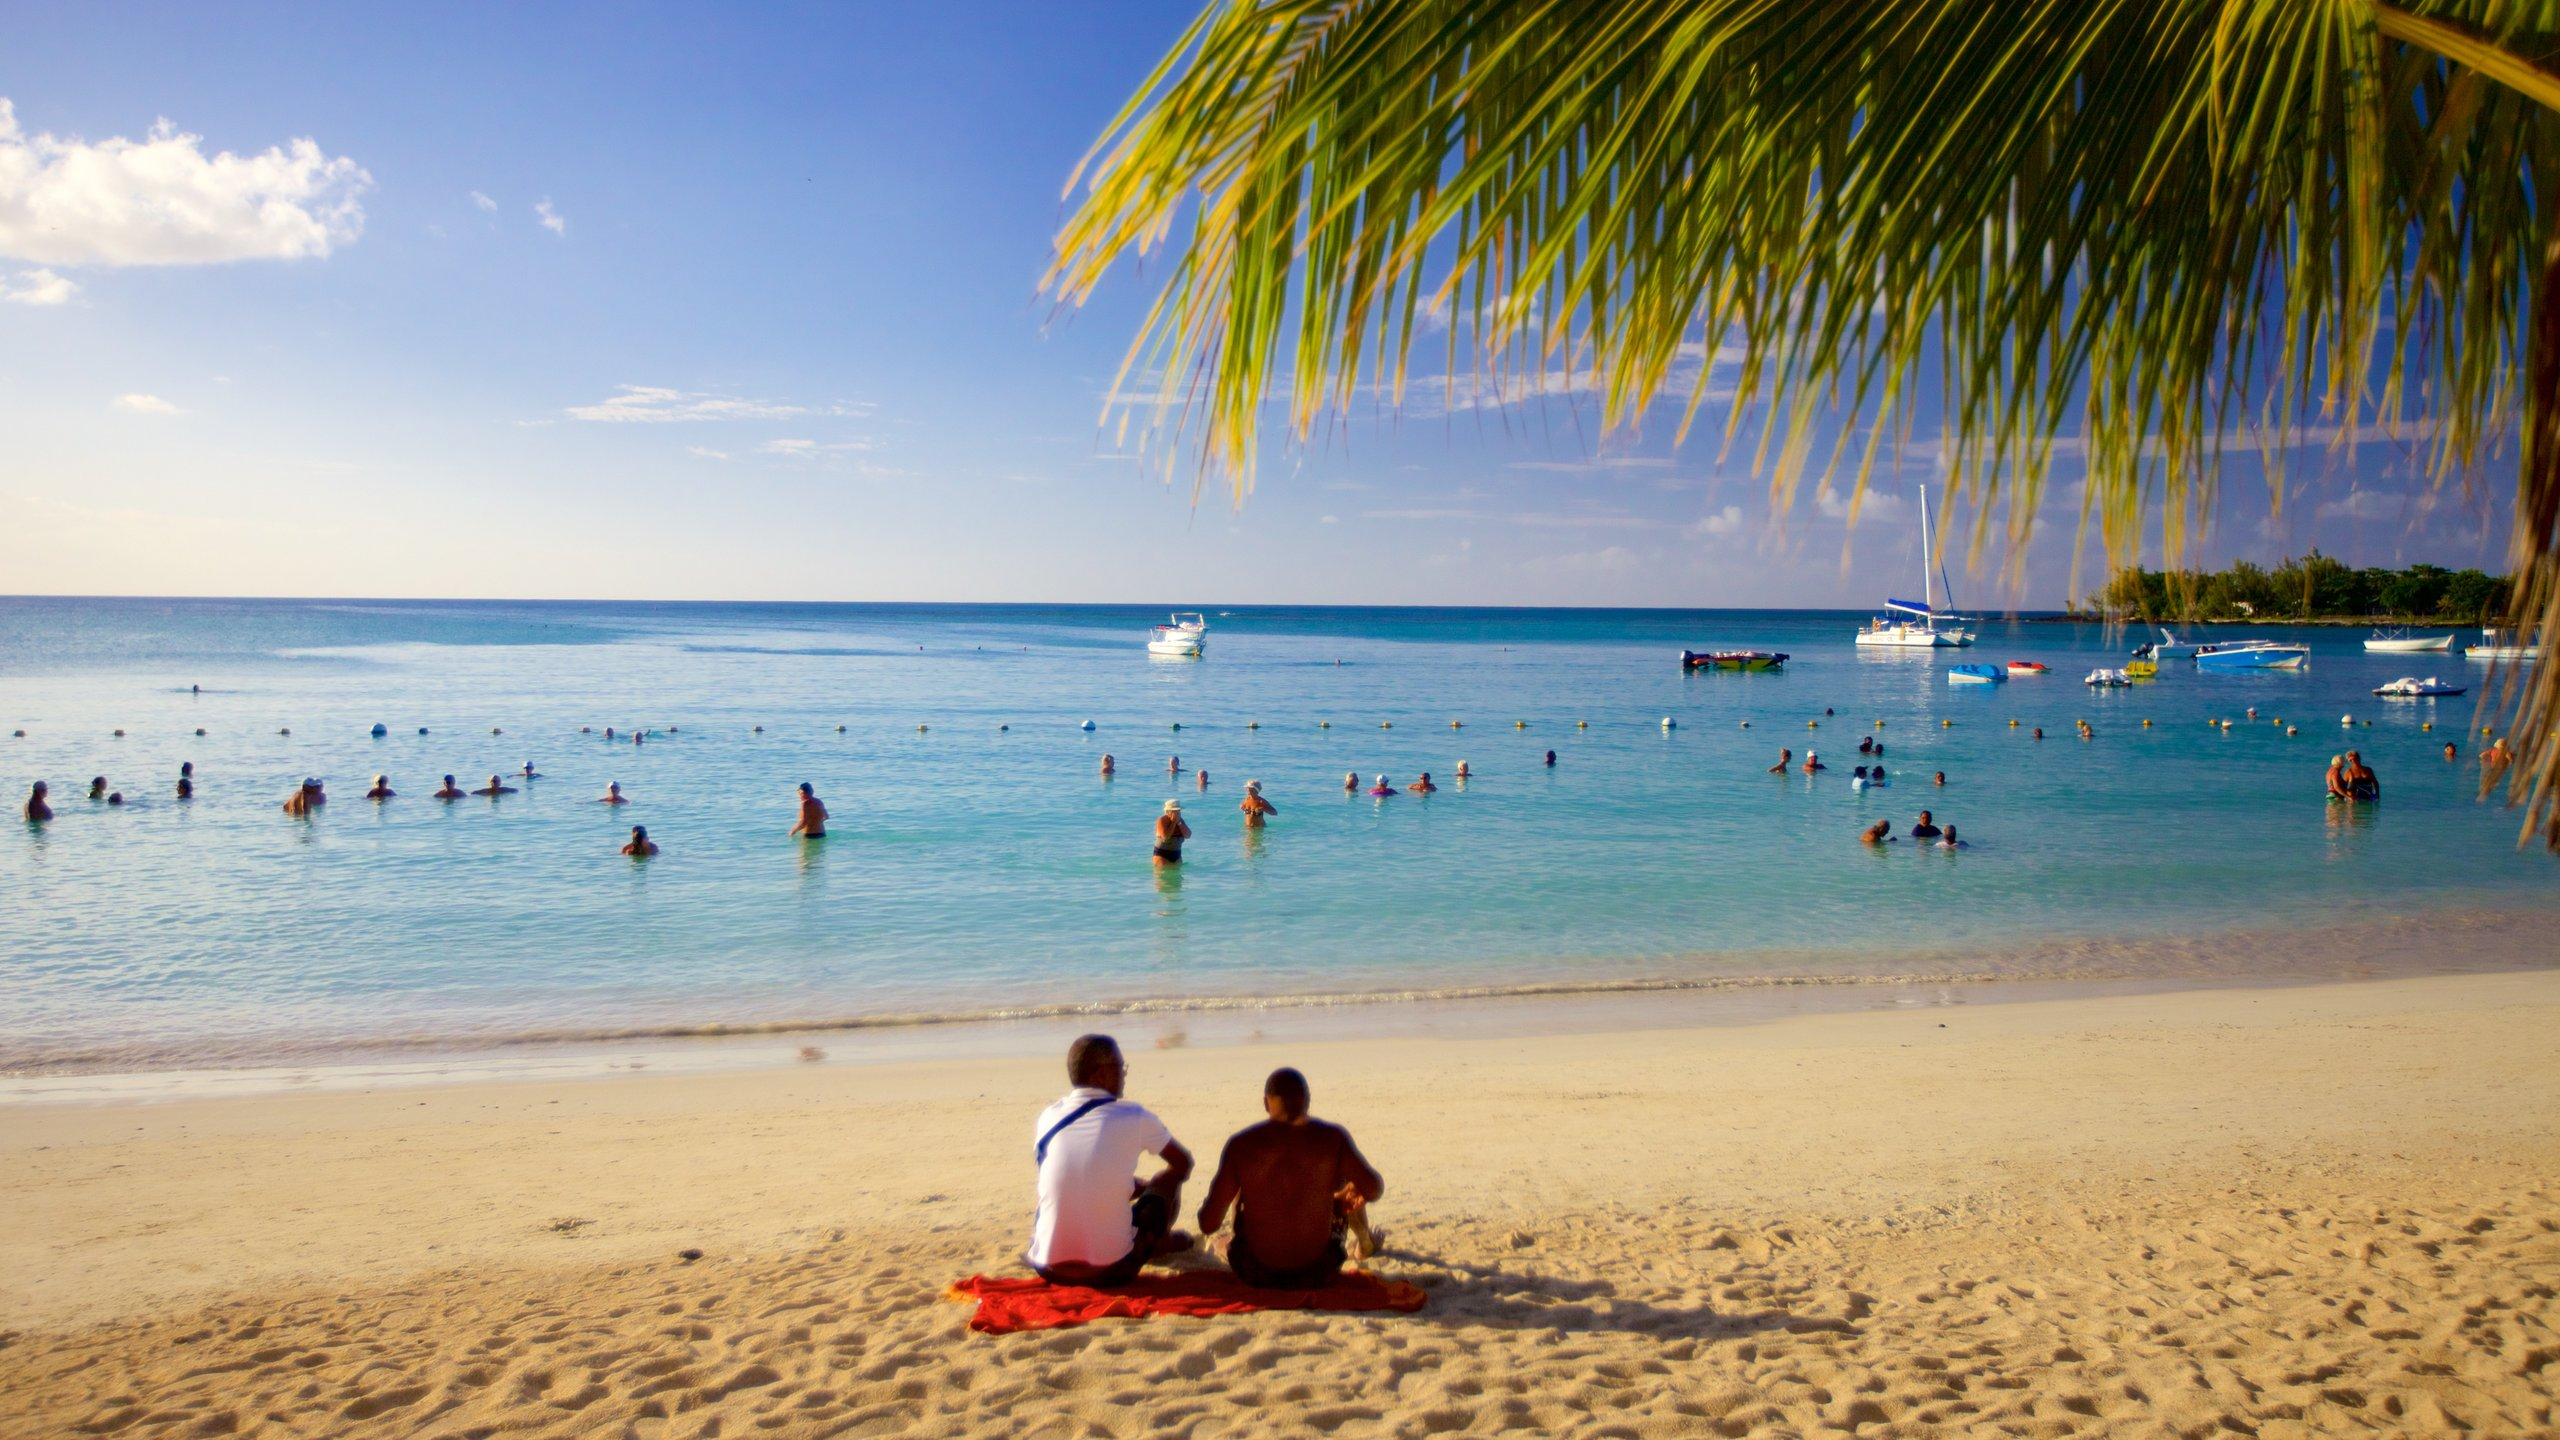 Pereybere, Grand-Baie, Rivière du Rempart, Mauritius